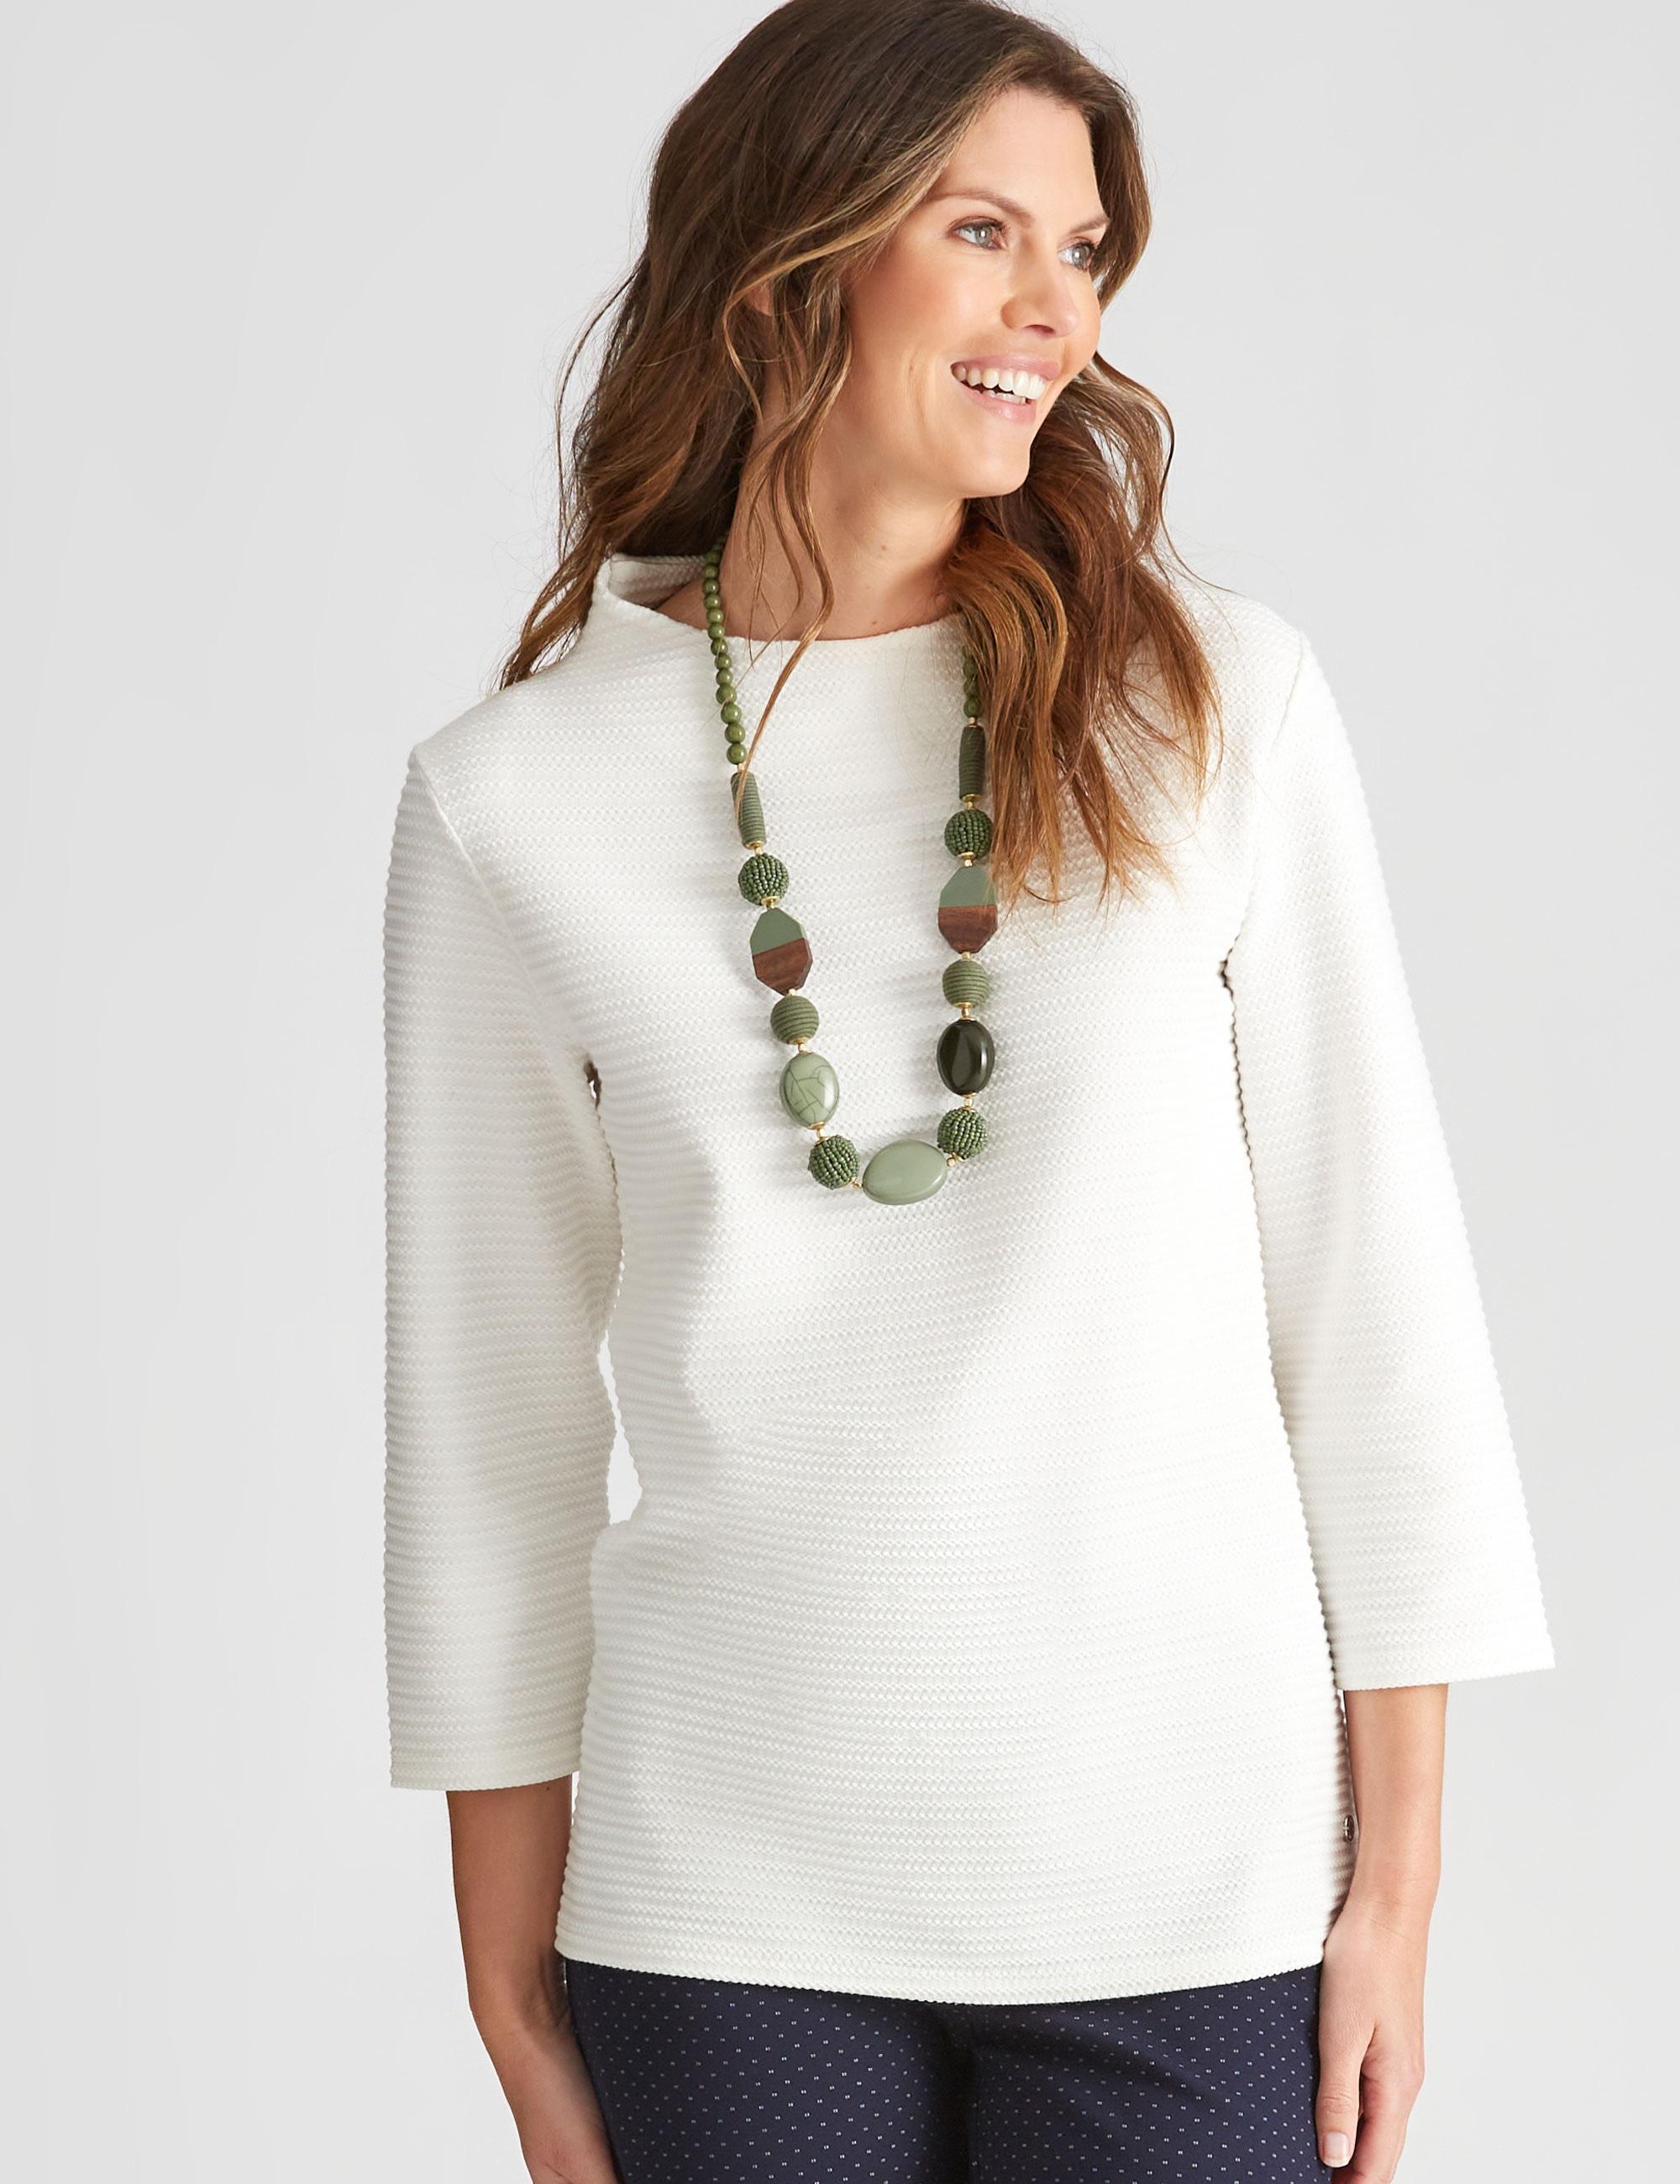 1056143130 1 - Women Fashion